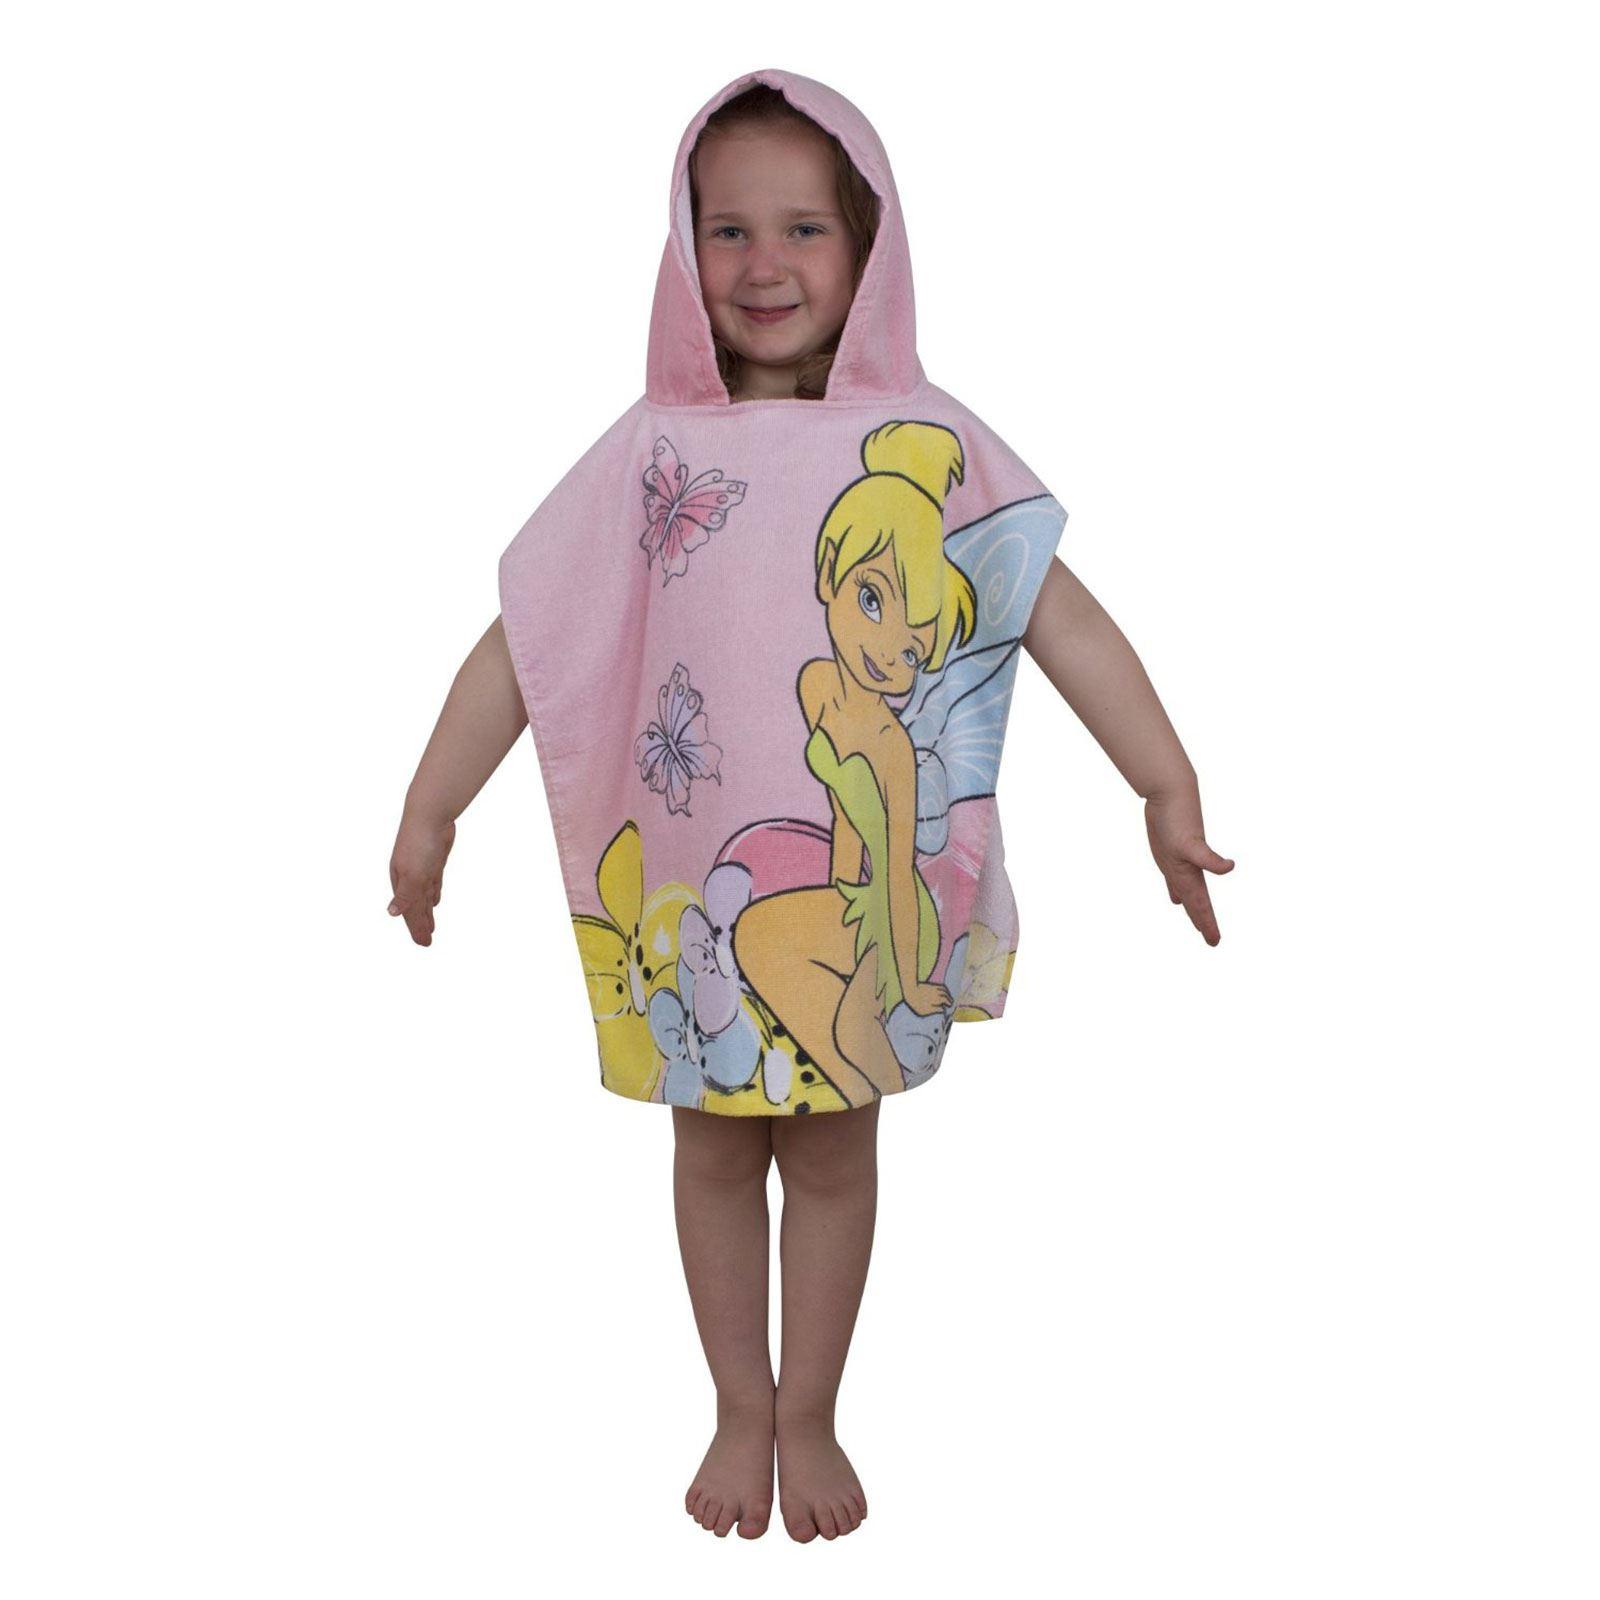 Poncho Baño Infantil:PERSONAJE PONCHO CON CAPUCHA TOALLAS – BAÑO, PLAYA O COBERTURA 100%